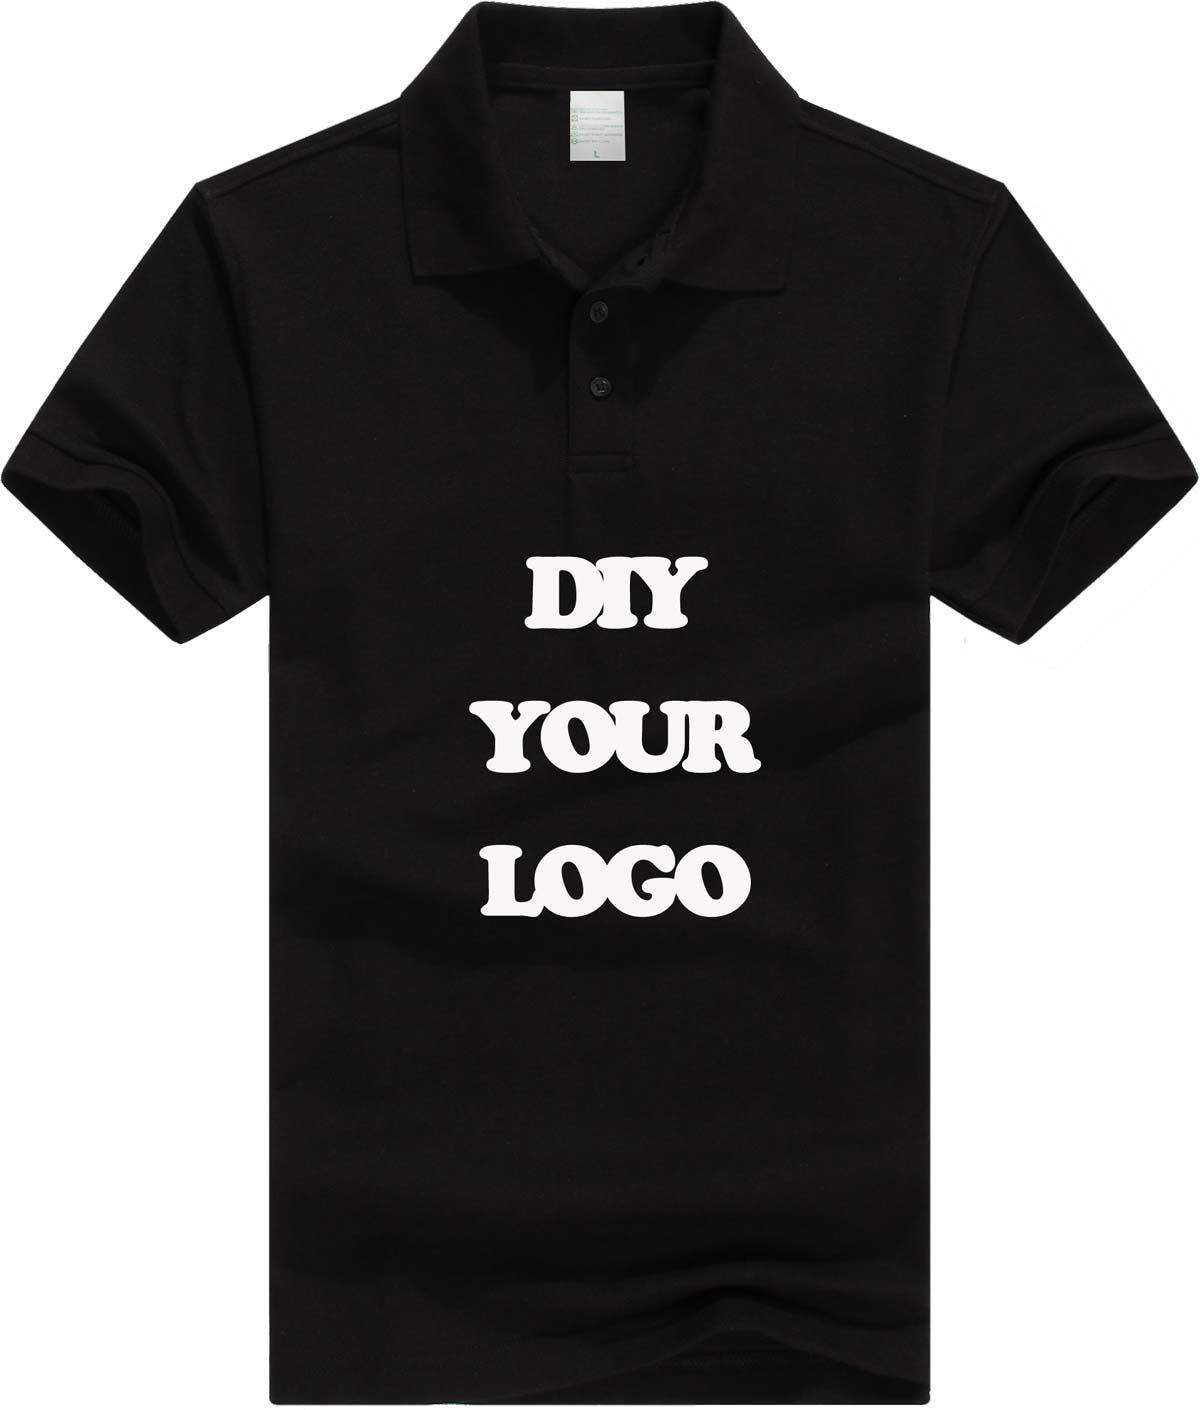 Fashion Cotton Men Women Camisa Custom Logo Polo Shirt Short Sleeve Print Work Shirts Embroidery Creat